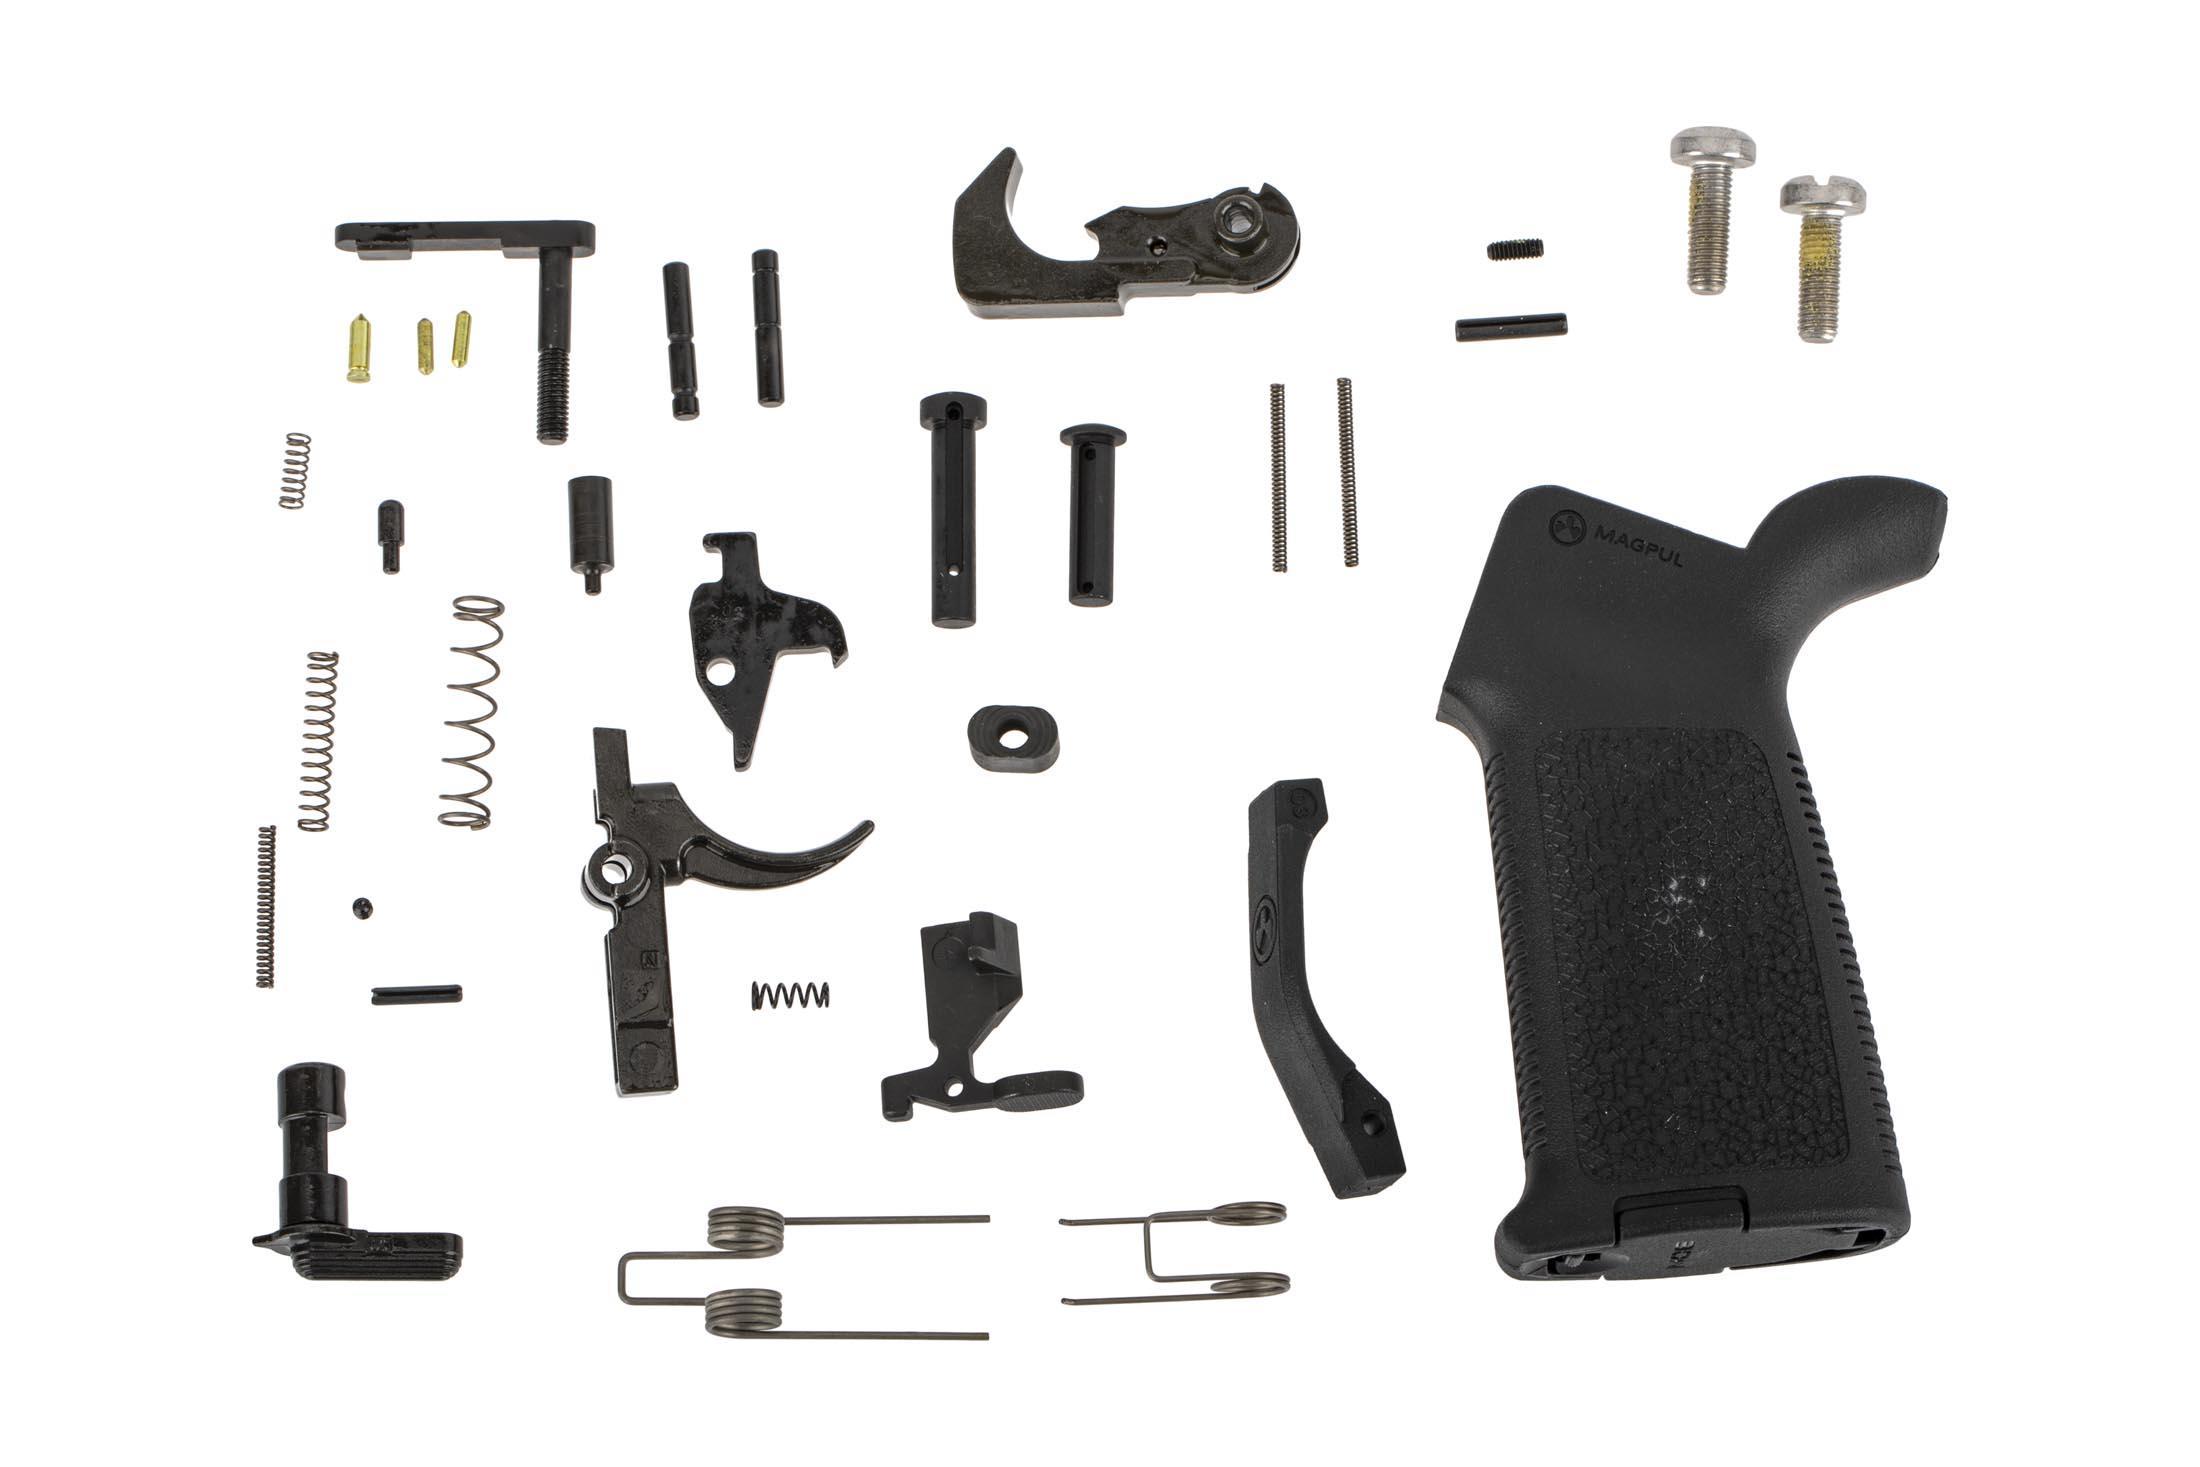 Aero Precision AR-15 MOE Complete Lower Parts Kit